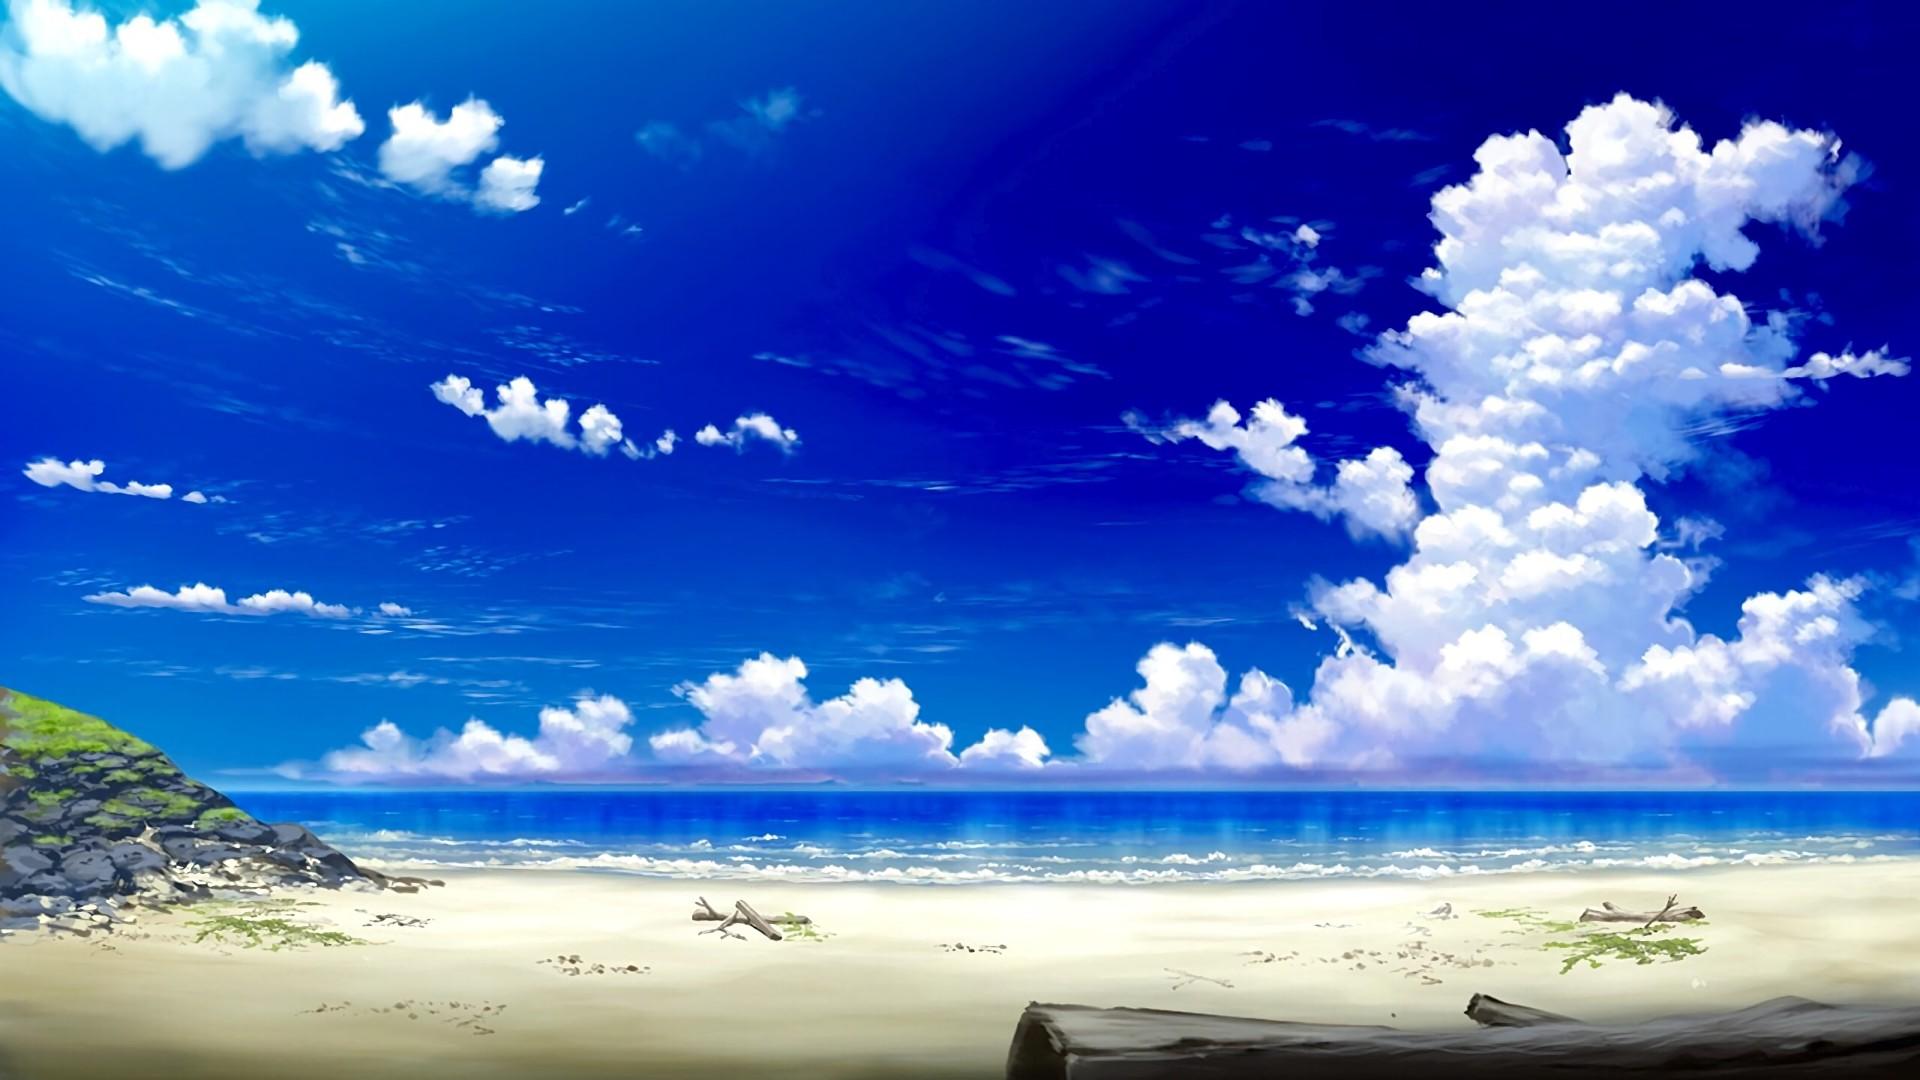 Anime Beach computer wallpaper